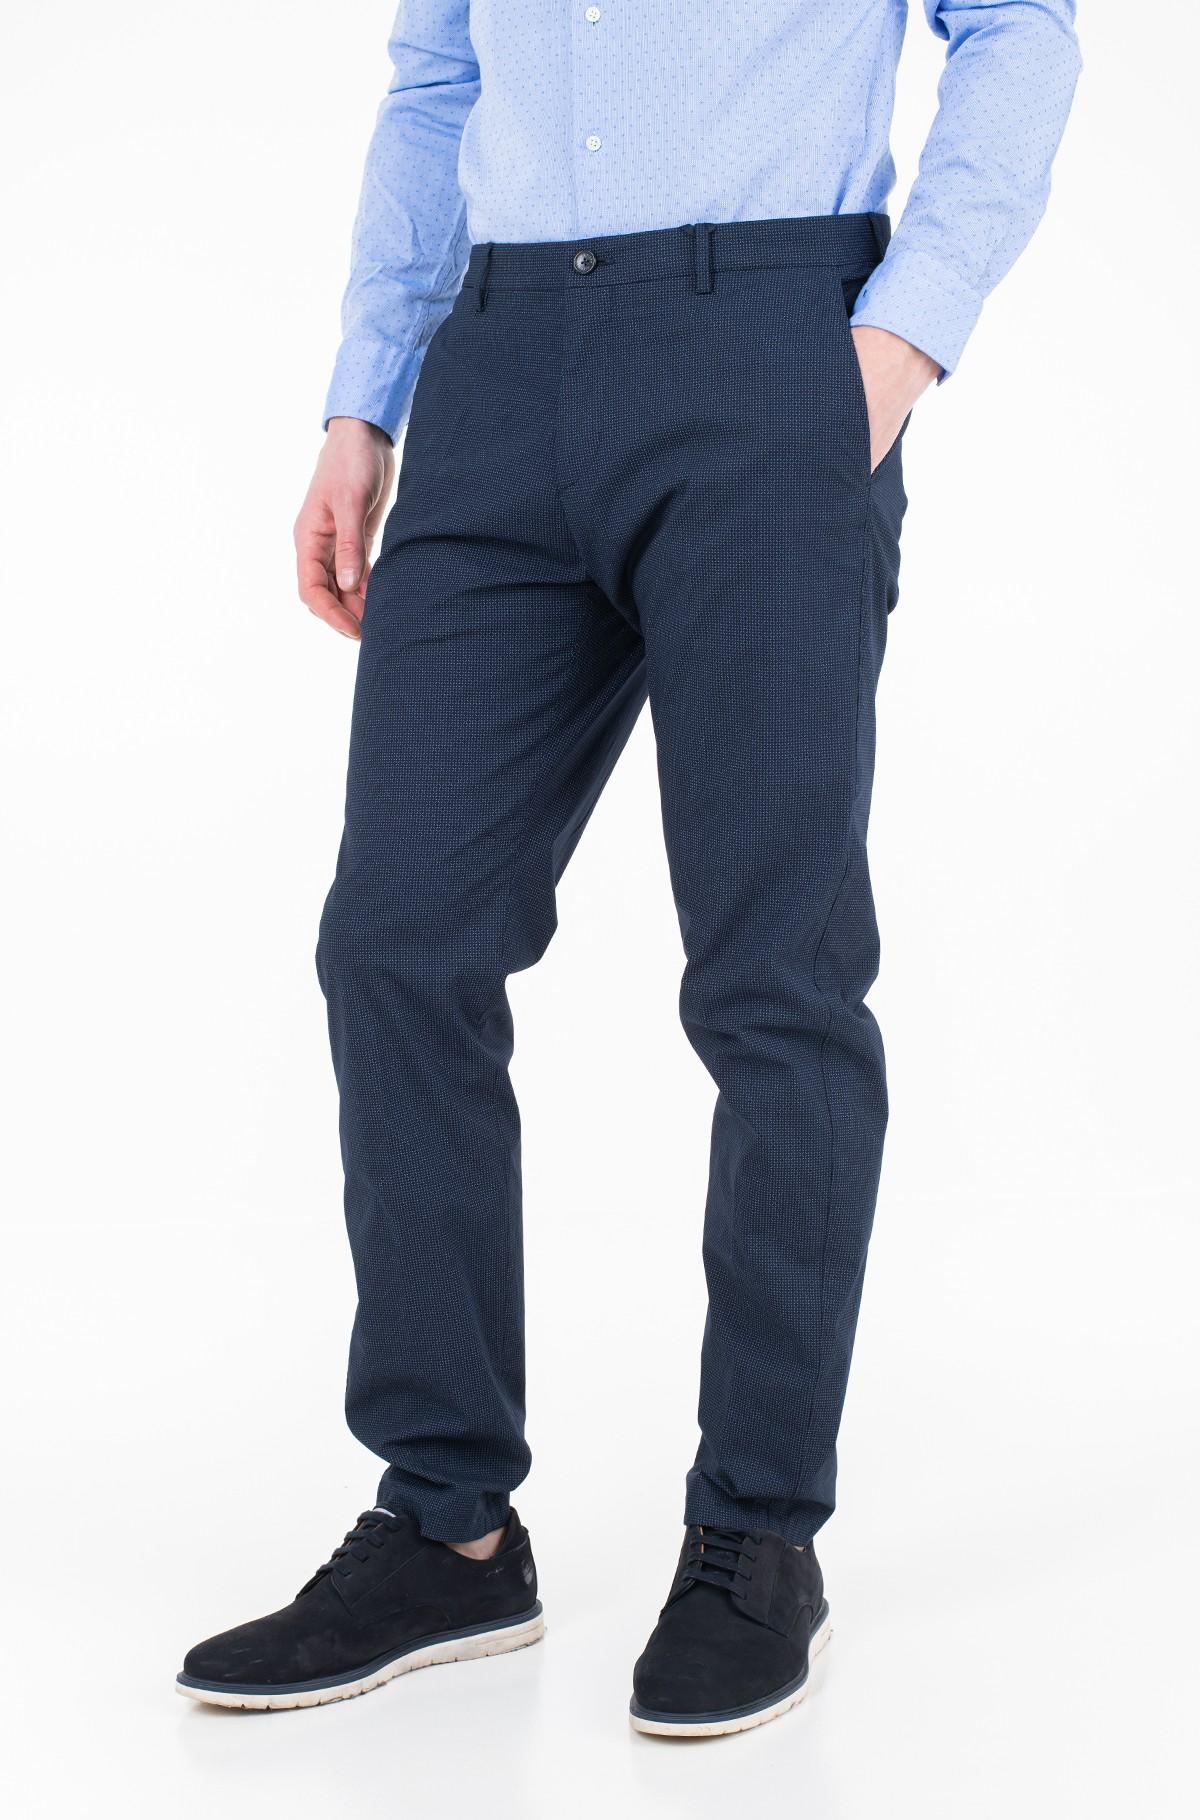 Trousers MINI PRINT SLIM FIT PANTS-full-1